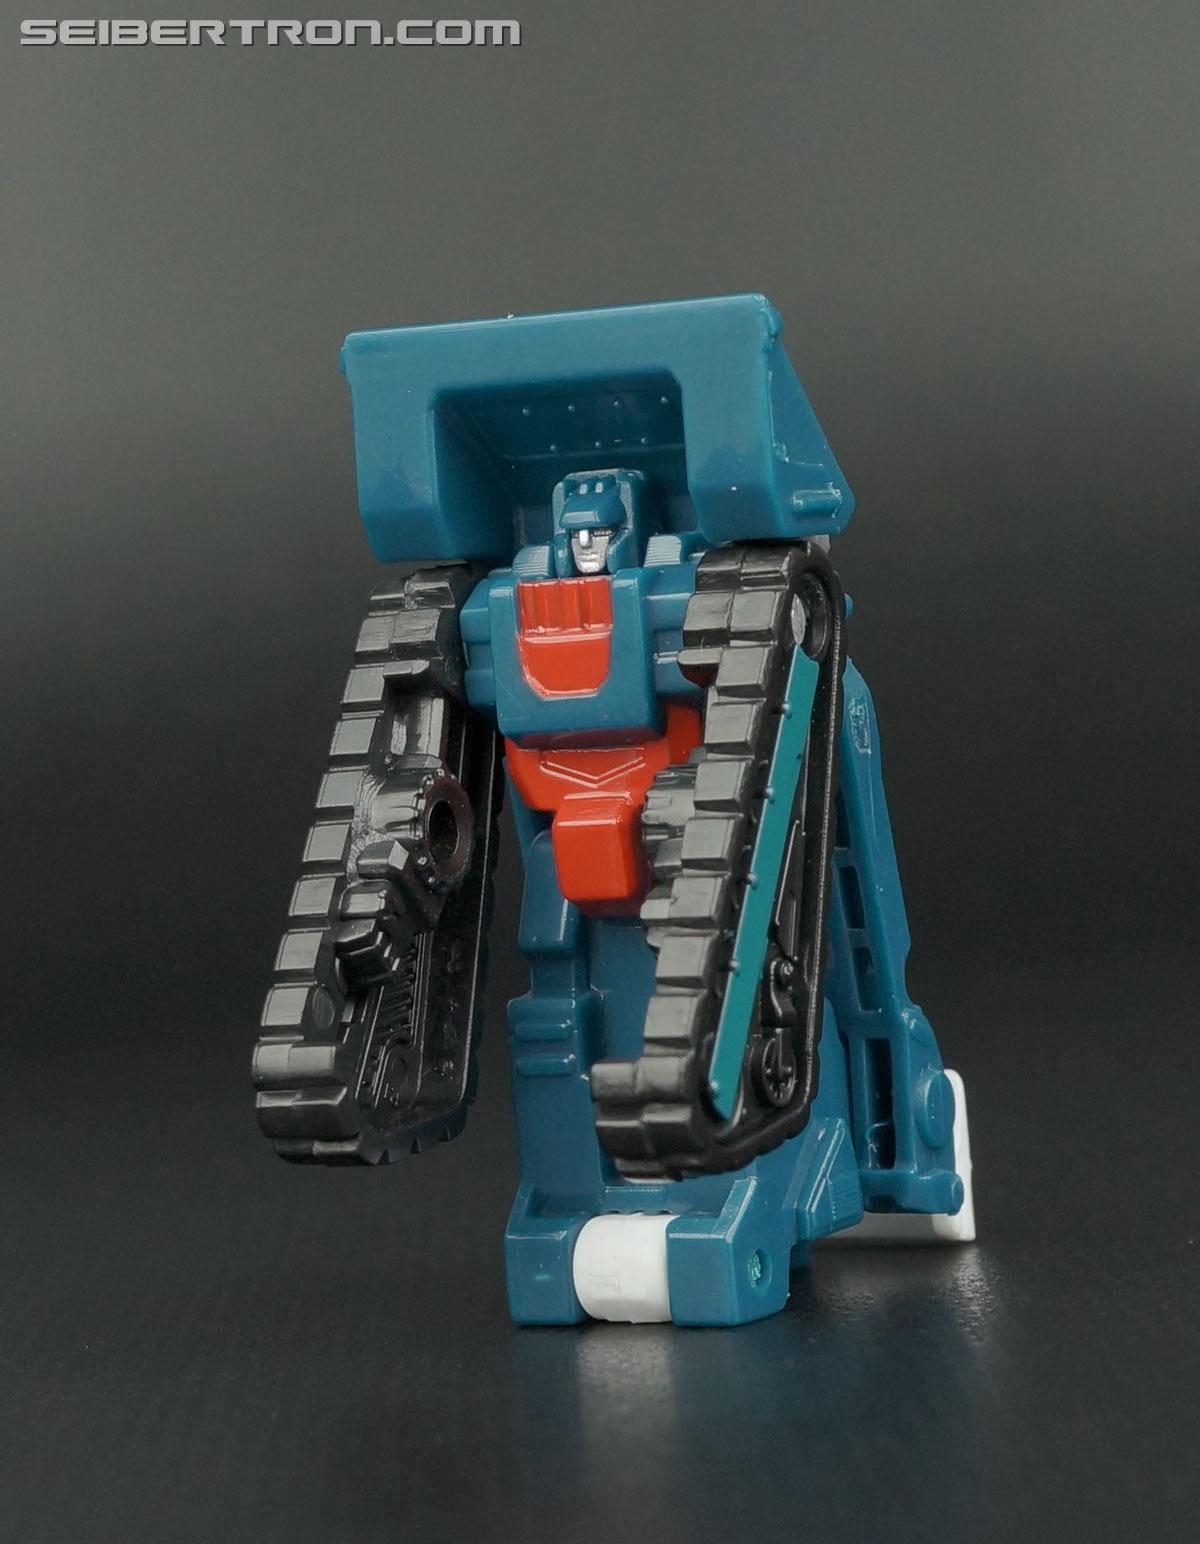 Transformers Legends Groundshaker (Image #50 of 66)